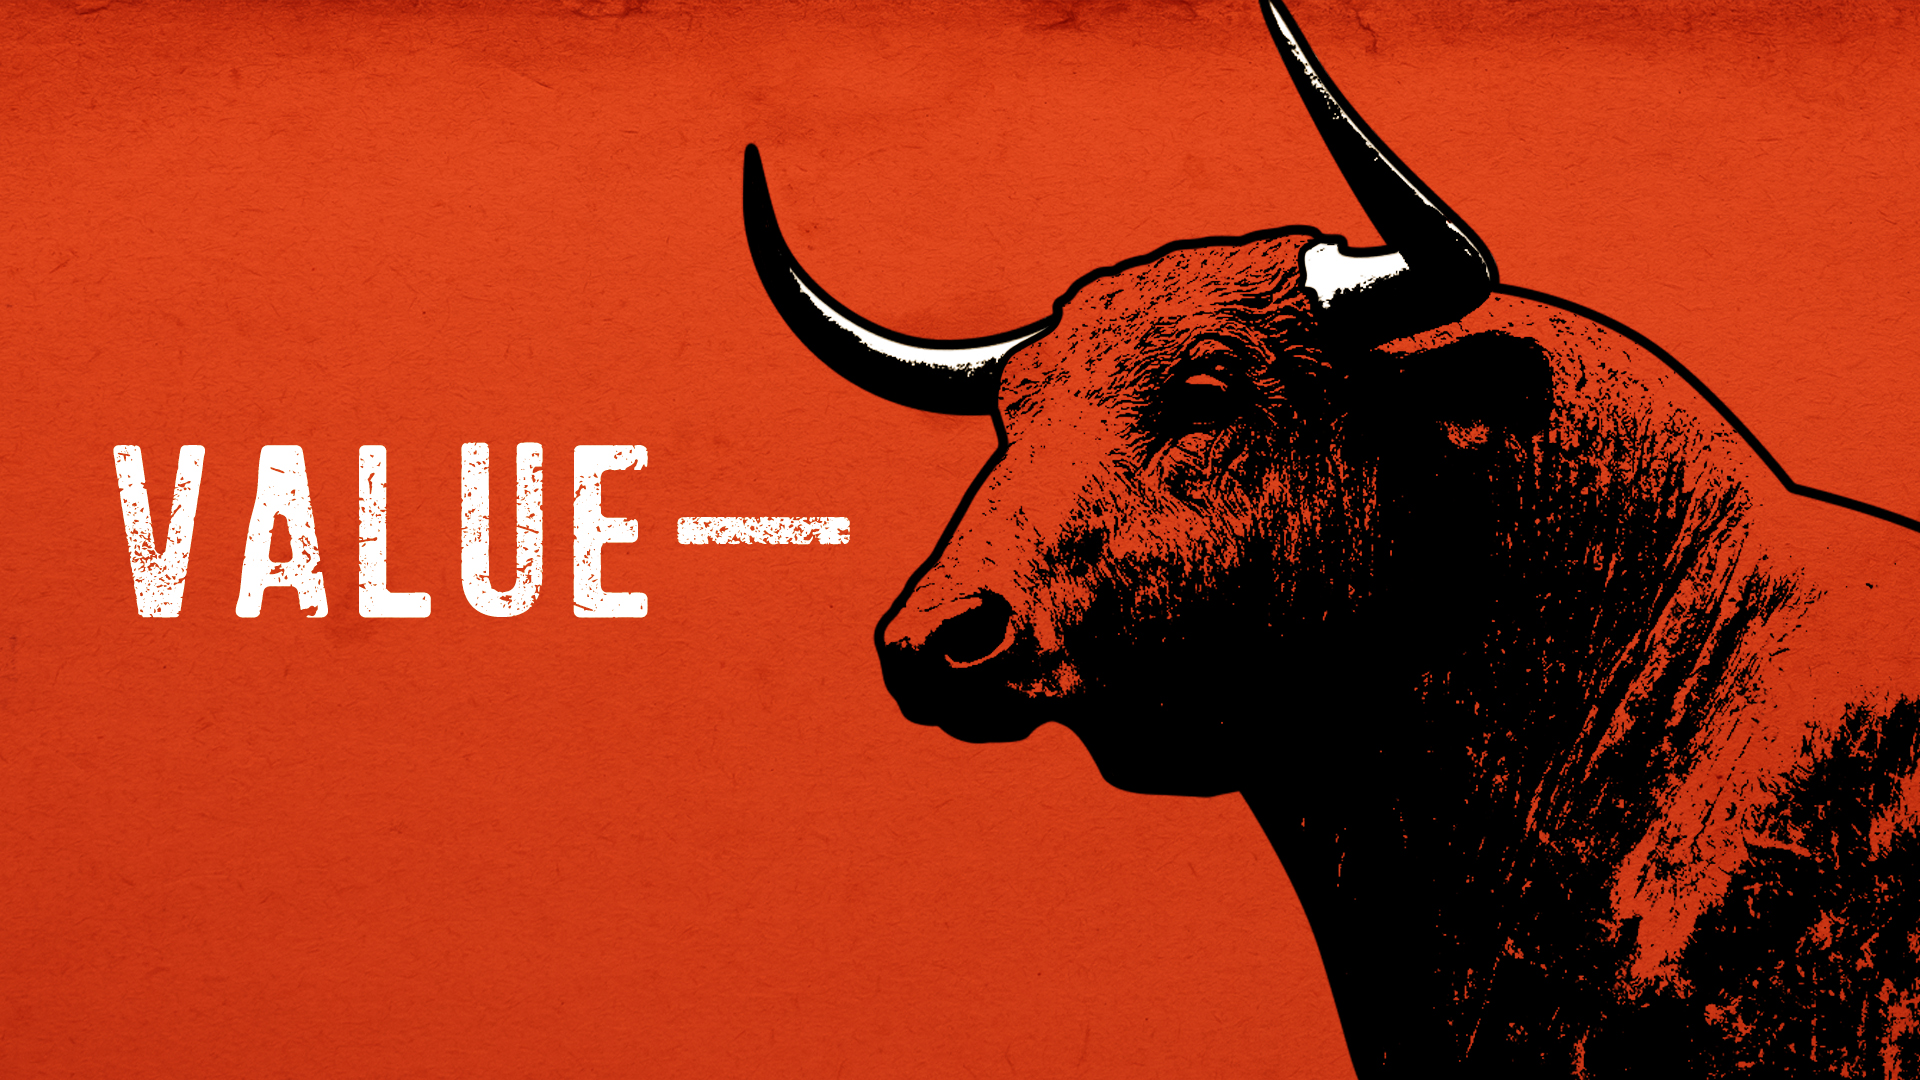 Value-bull